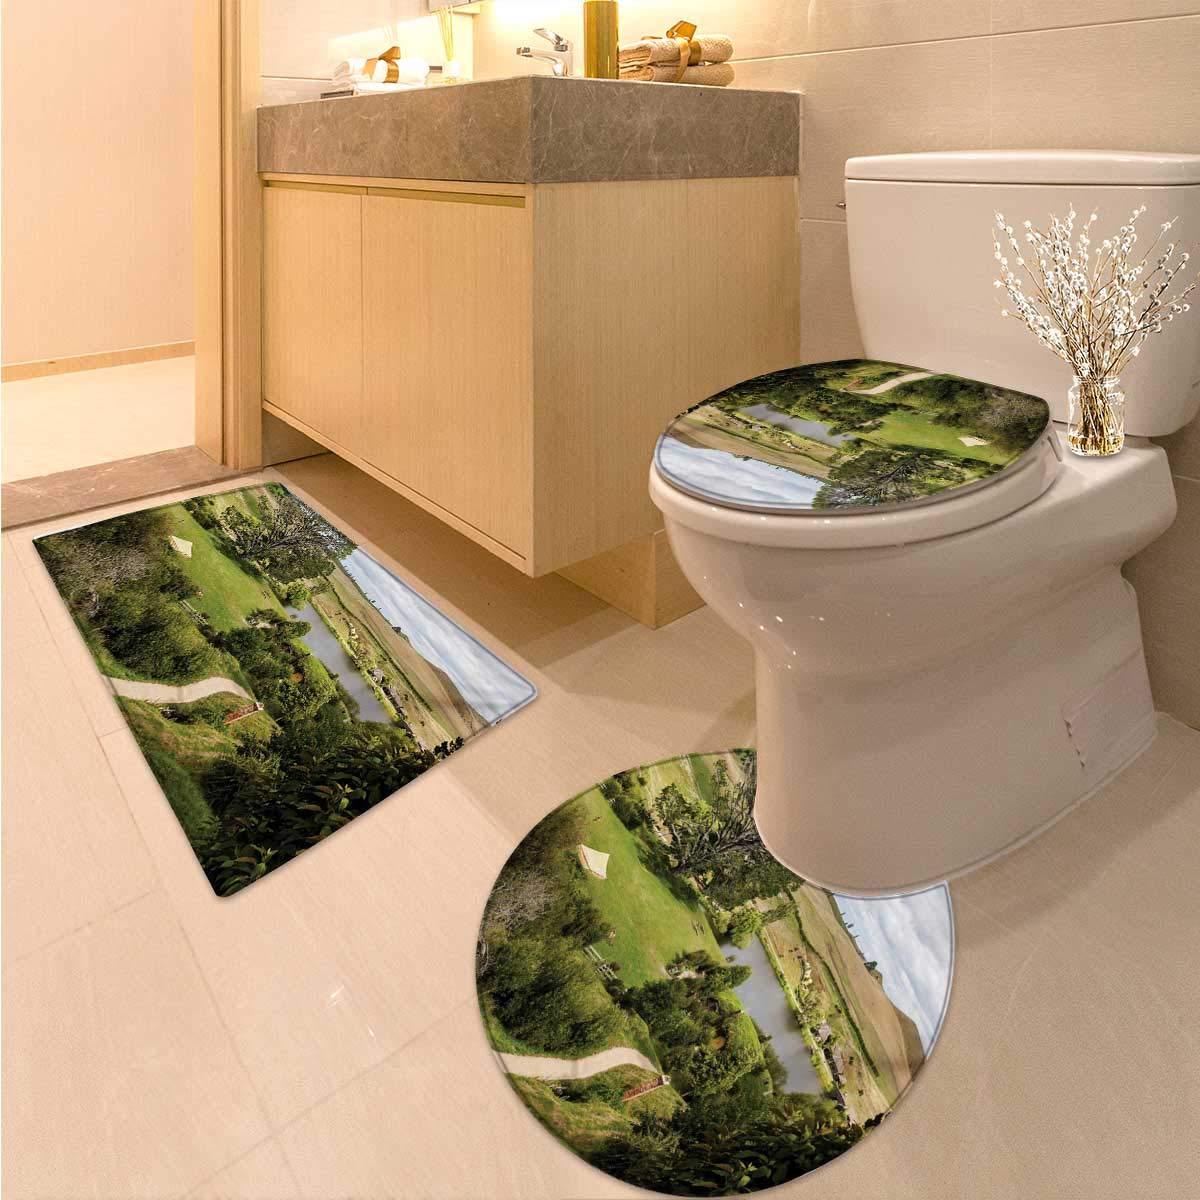 Anhuthree Hobbits bathmat Toilet mat Set Overhill Matamata New Zealand Movie Set Hobbit Land Village Movie Set Image Toilet Carpet Floor mat Green Brown